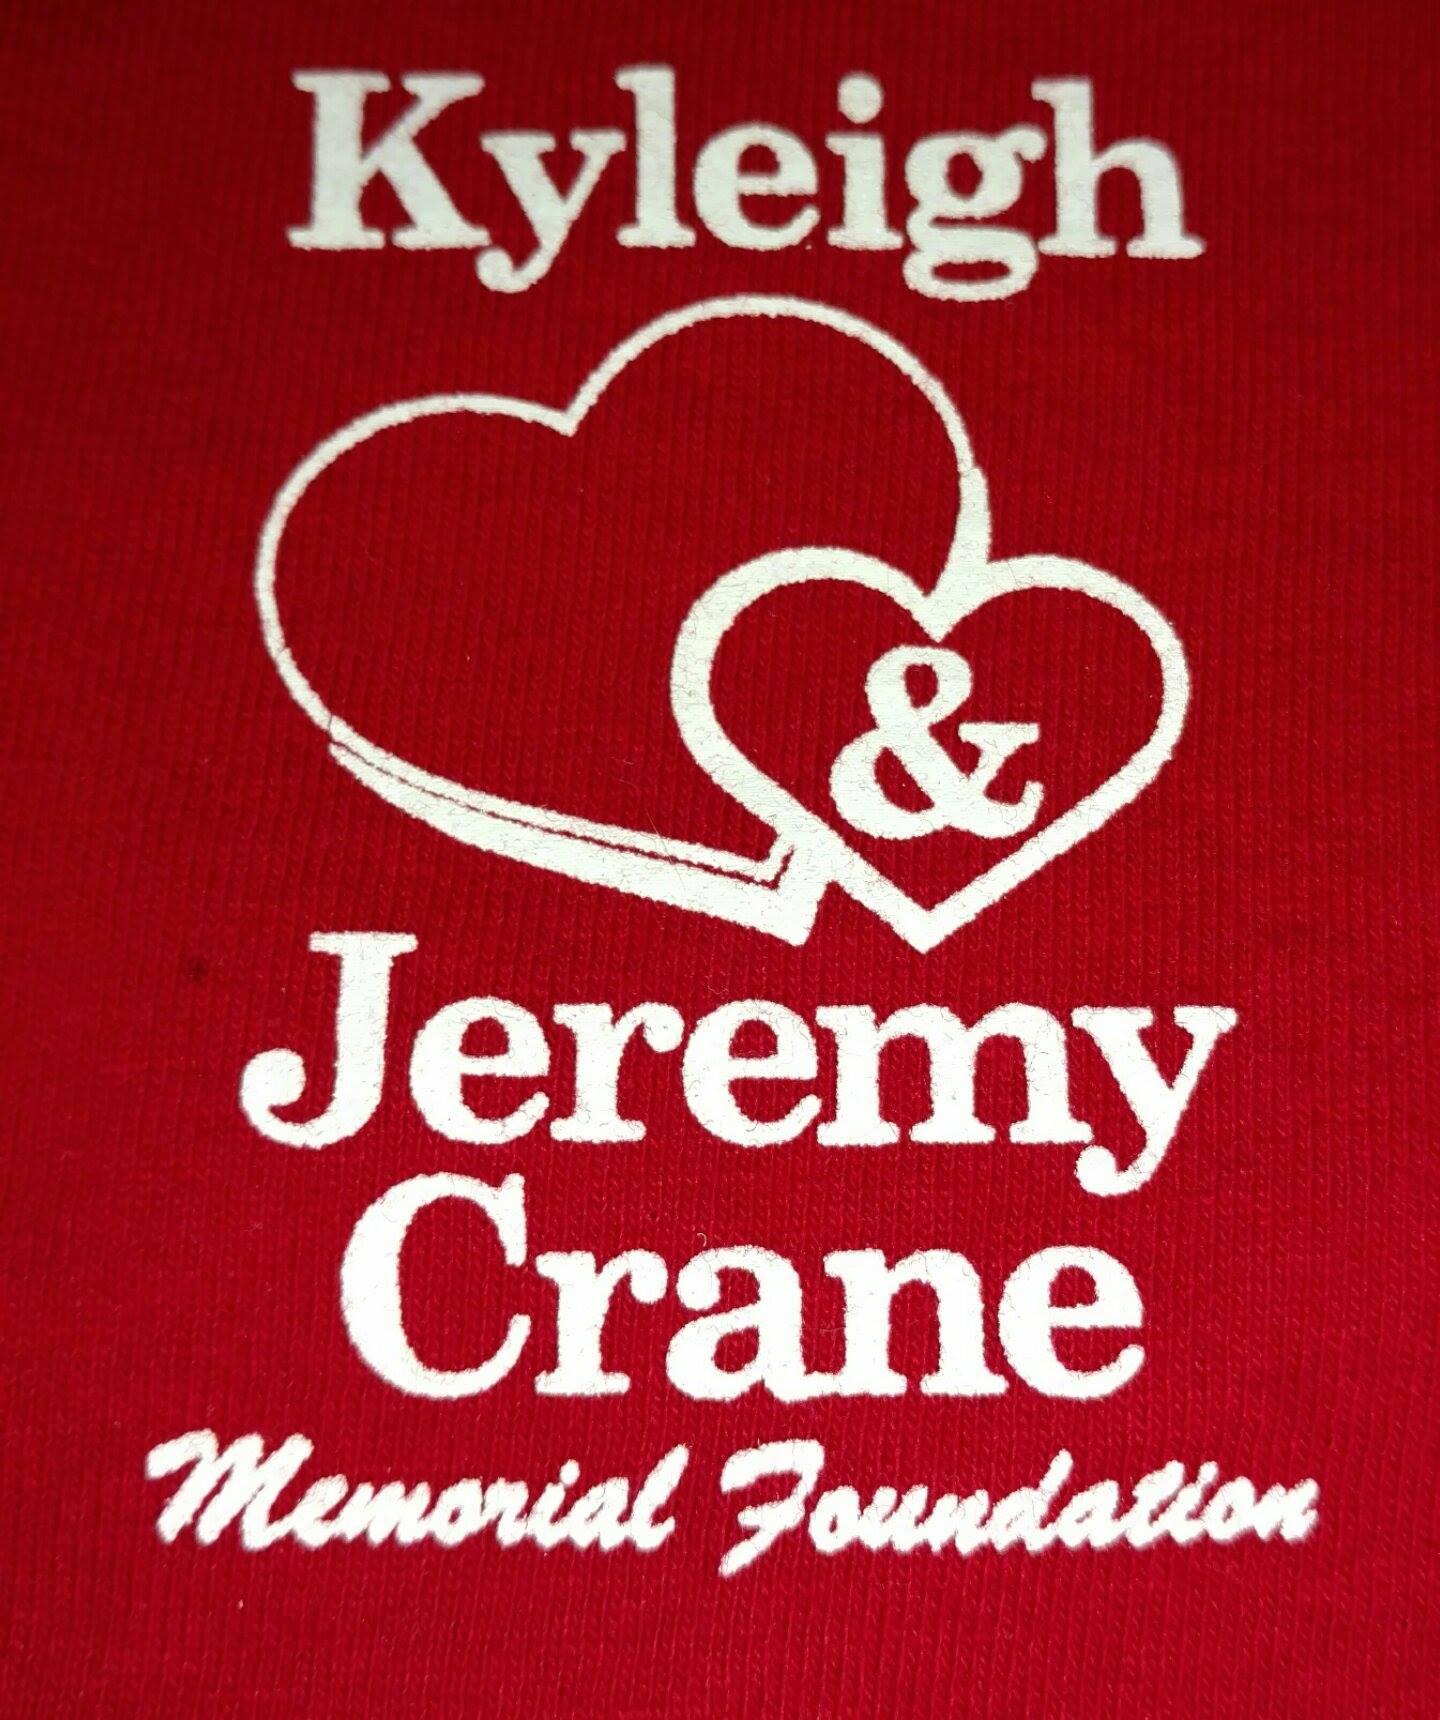 Kyleigh & Jeremy Crane